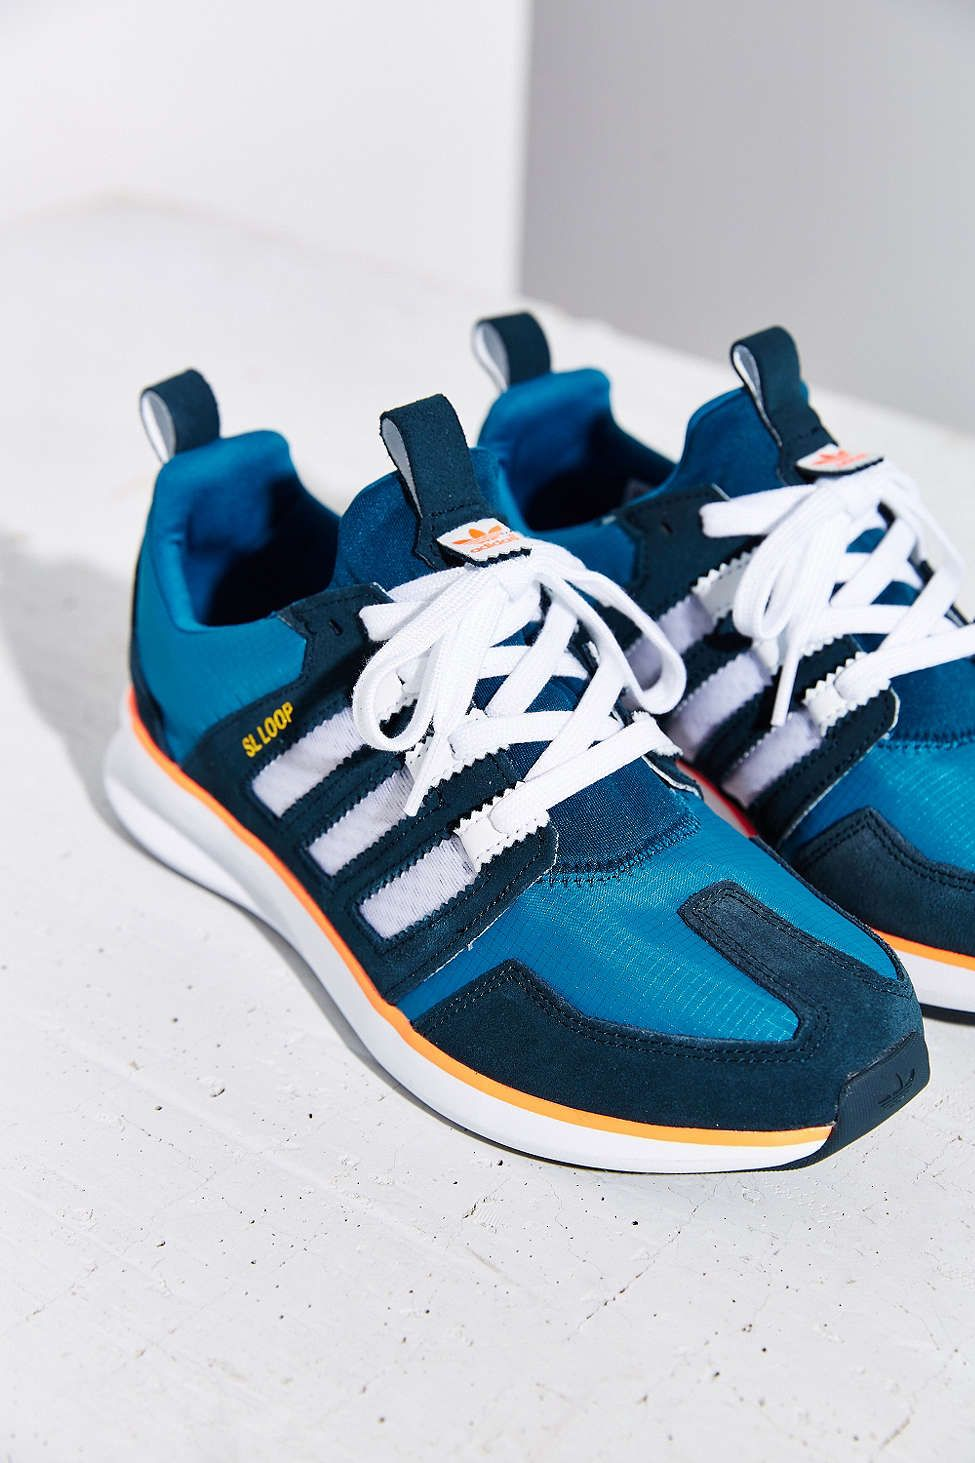 Adidas Sl Loop Runner Scarpe Pinterest Scarpe Adidas, Urban